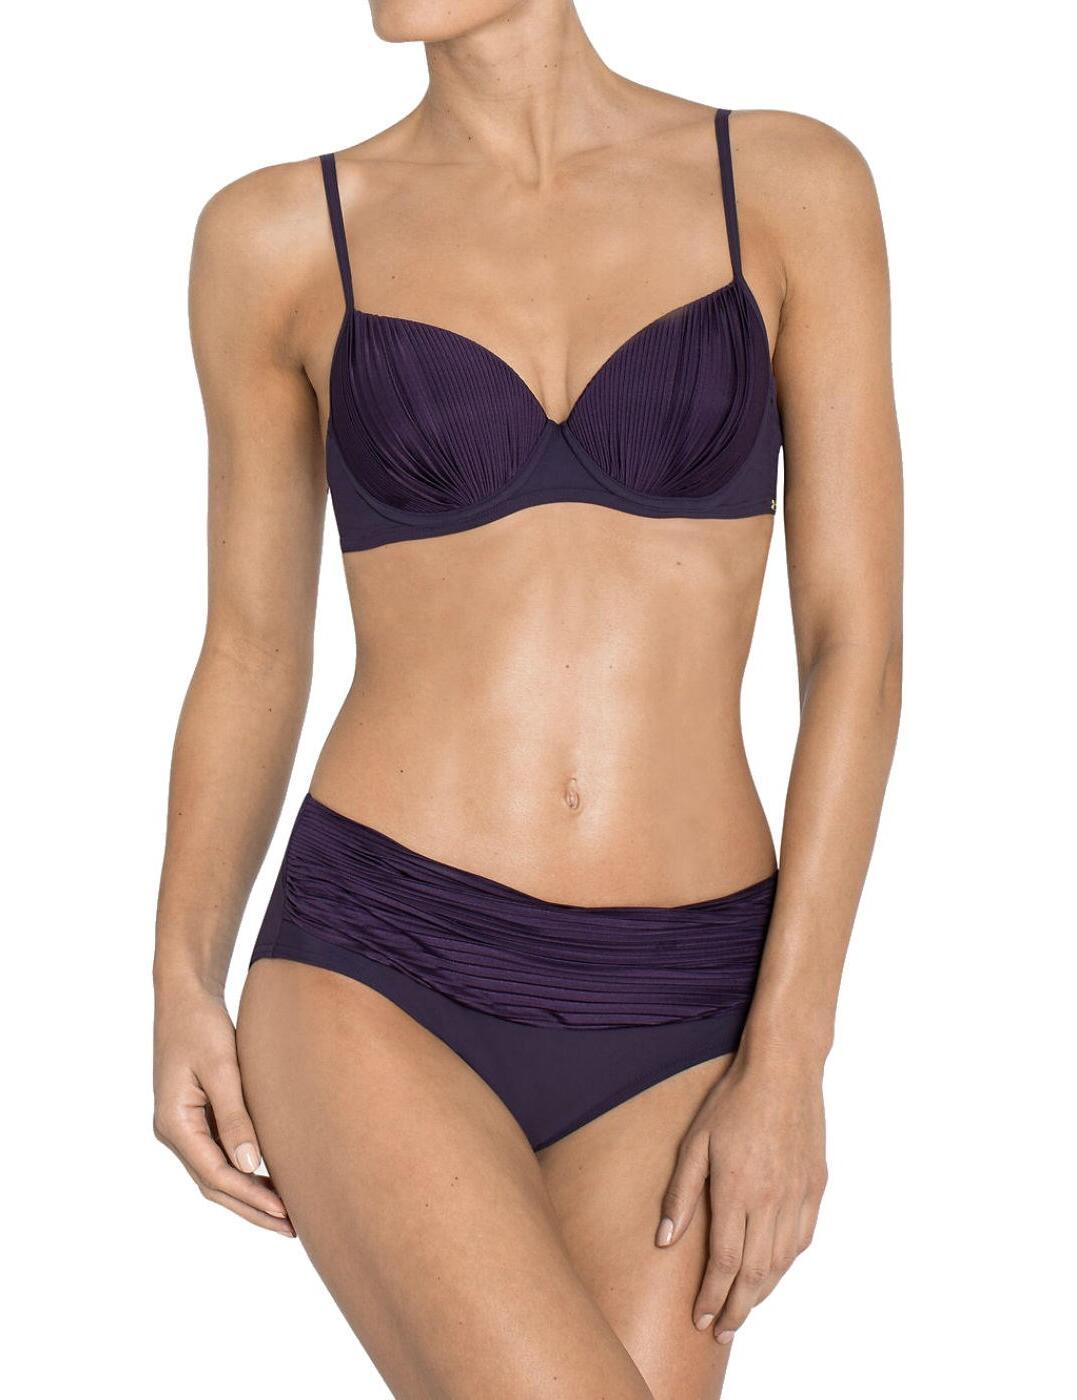 f98bd6b20f216 Triumph Venus Elegance Wired Padded Swimsuit - Belle Lingerie